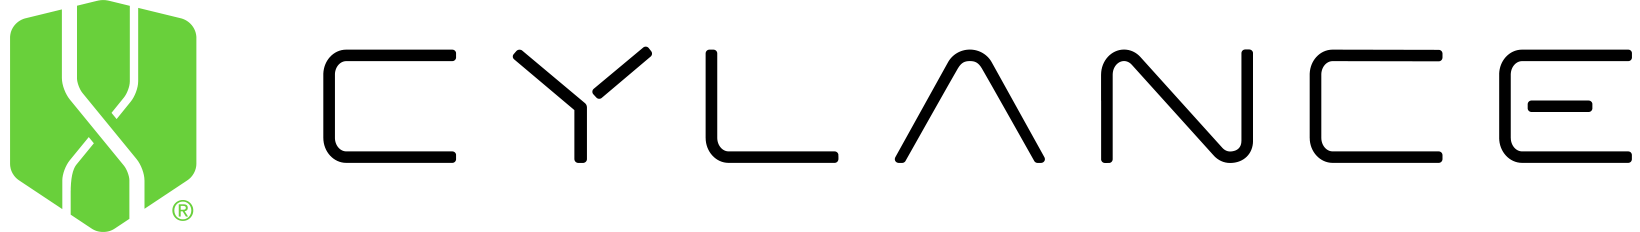 Cylance_logo.png